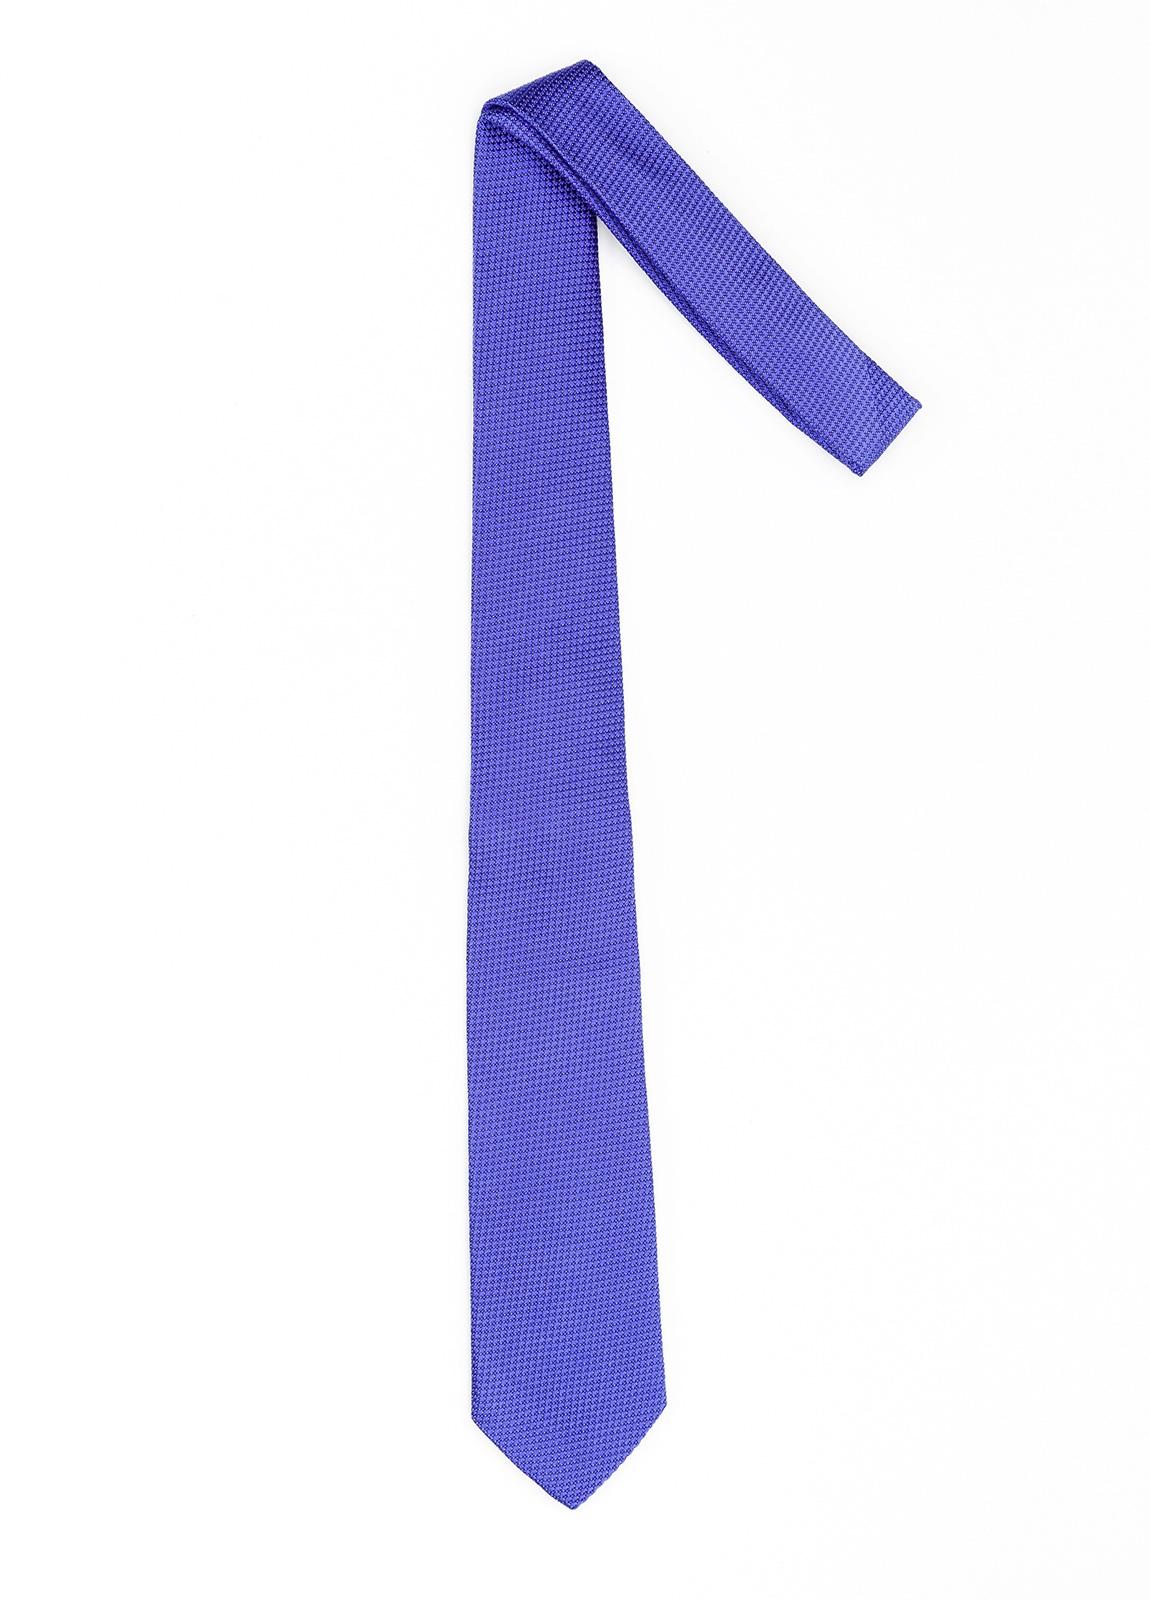 Corbata Formal Wear microtextura color azul. Pala 7,5 cm. 100% Seda. - Ítem1